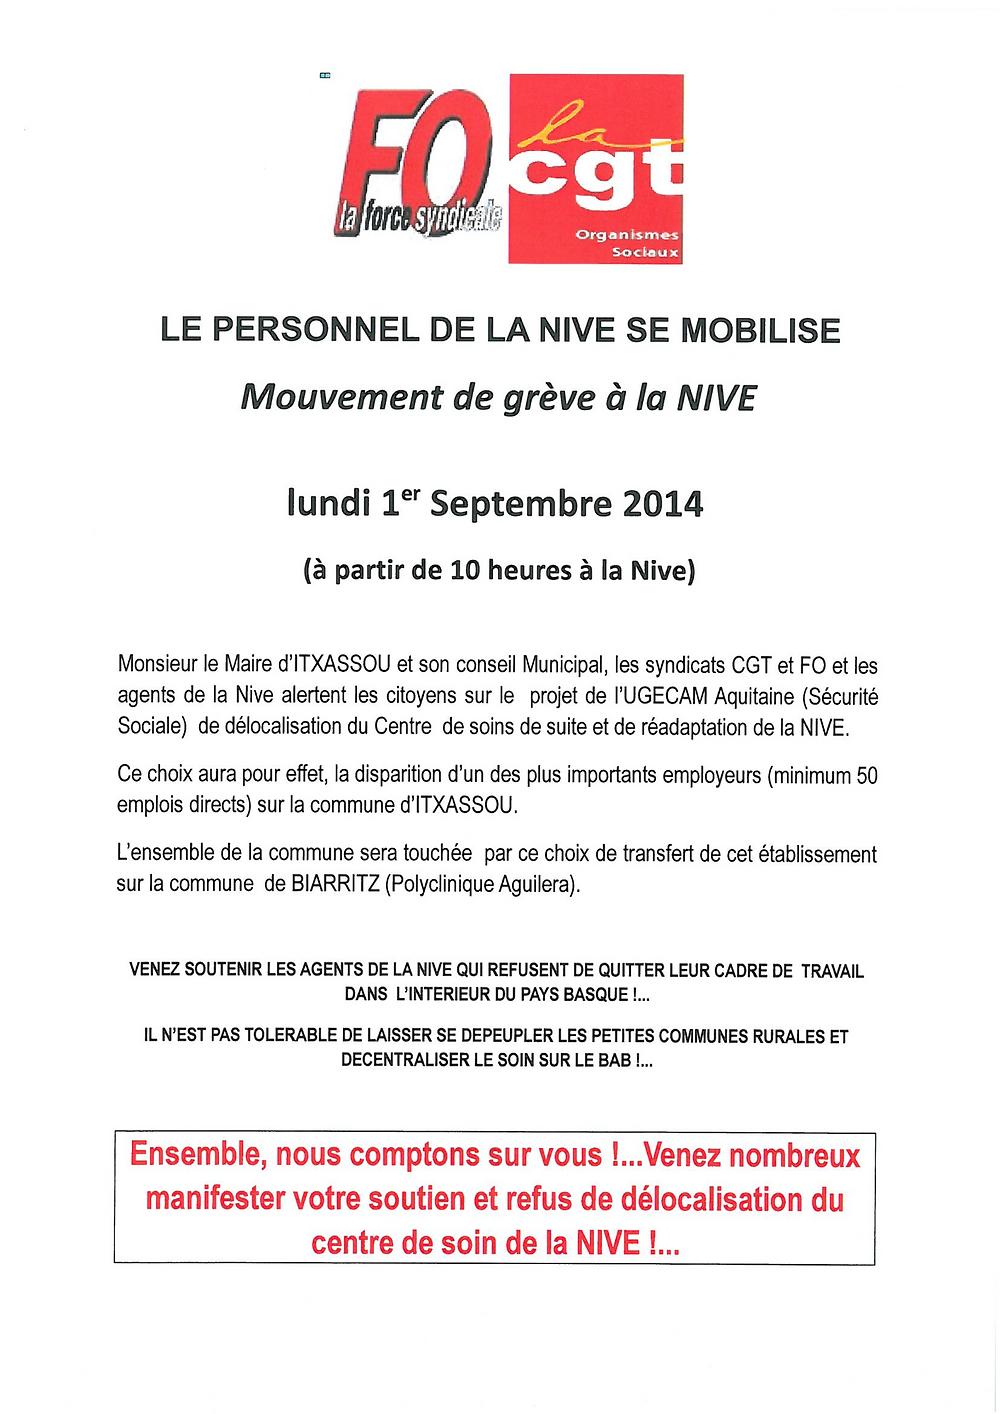 tract la nive 01 09 2014.png